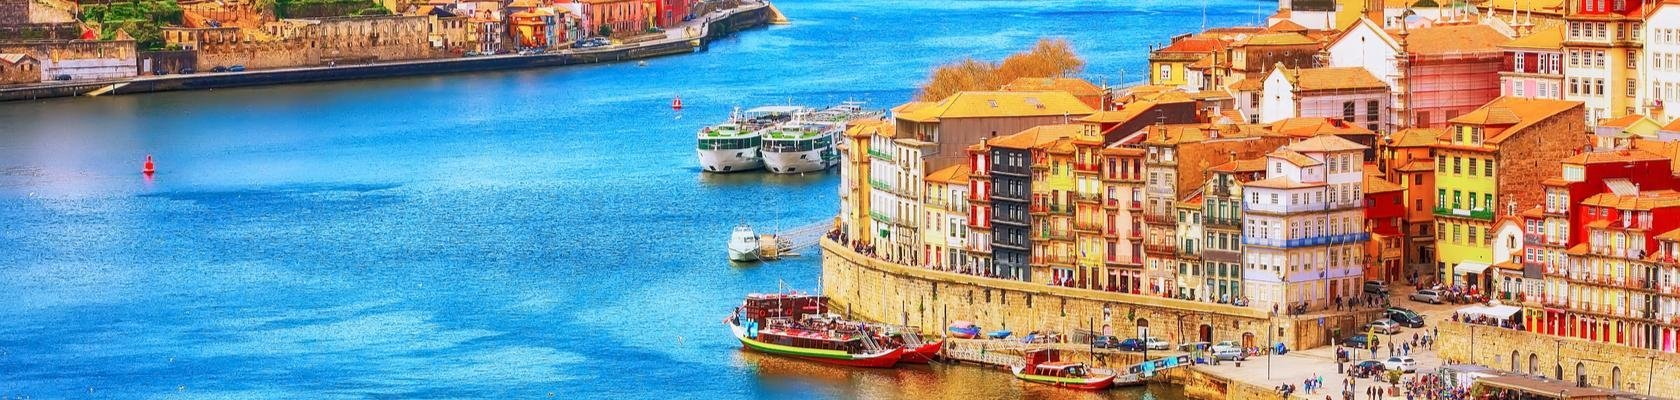 Porto aan de rivier de Douro